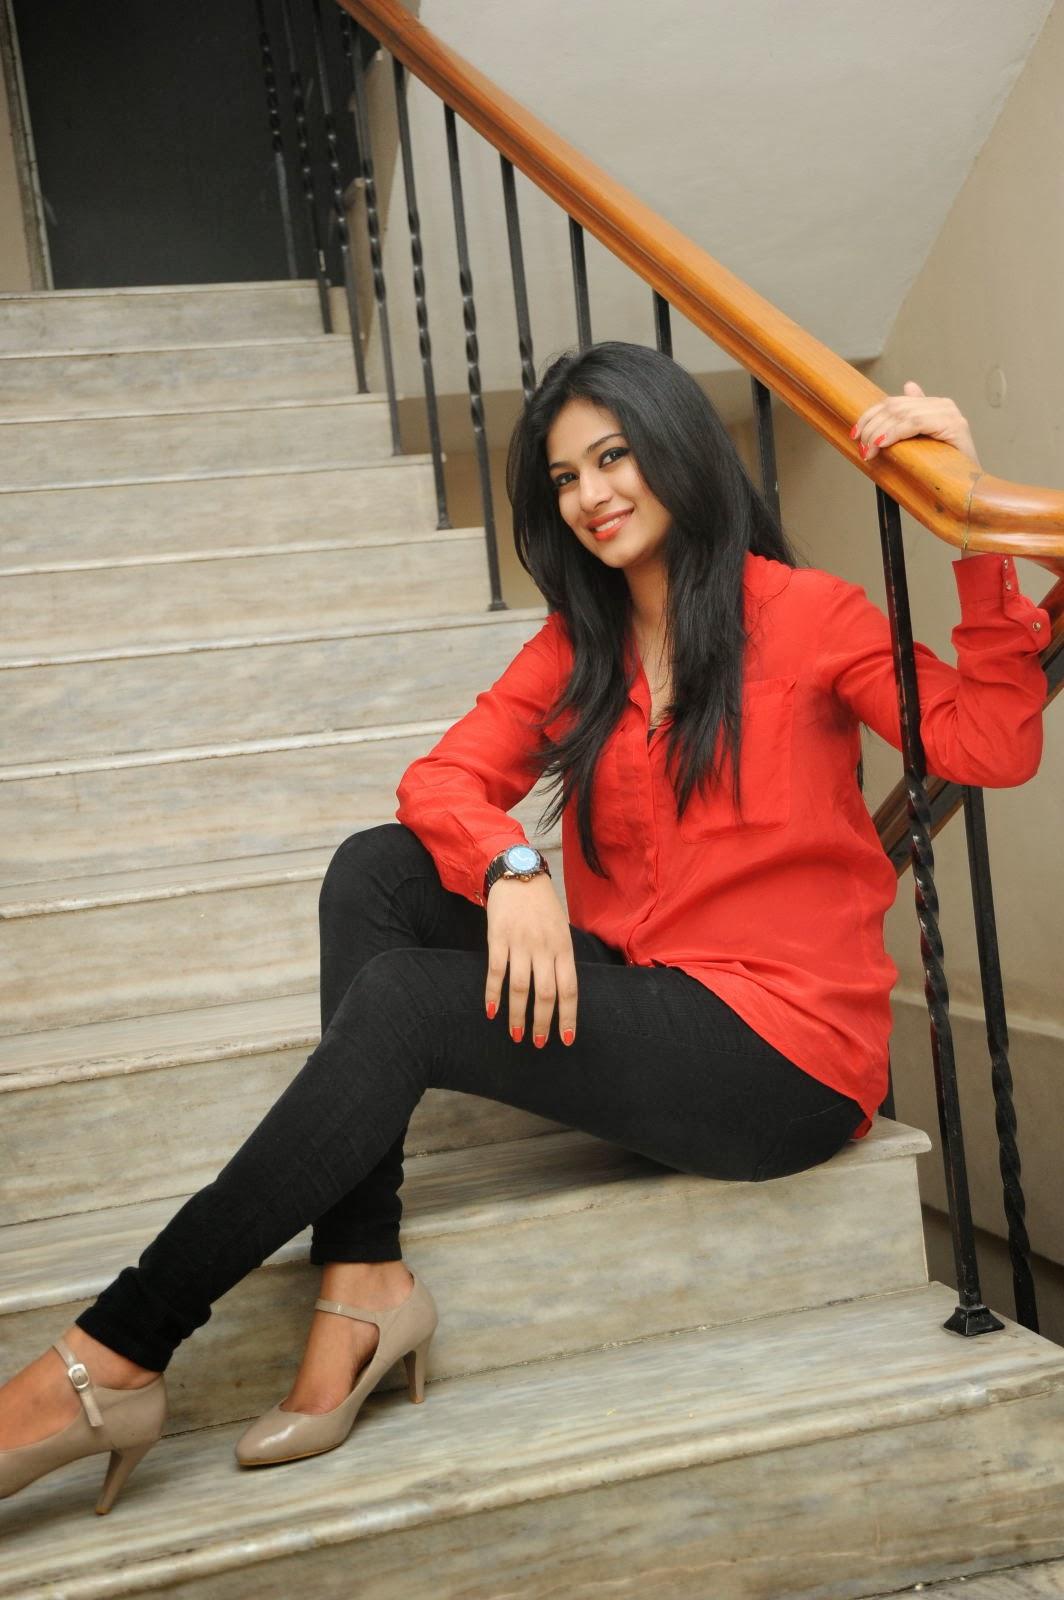 Zara Shah sexy images